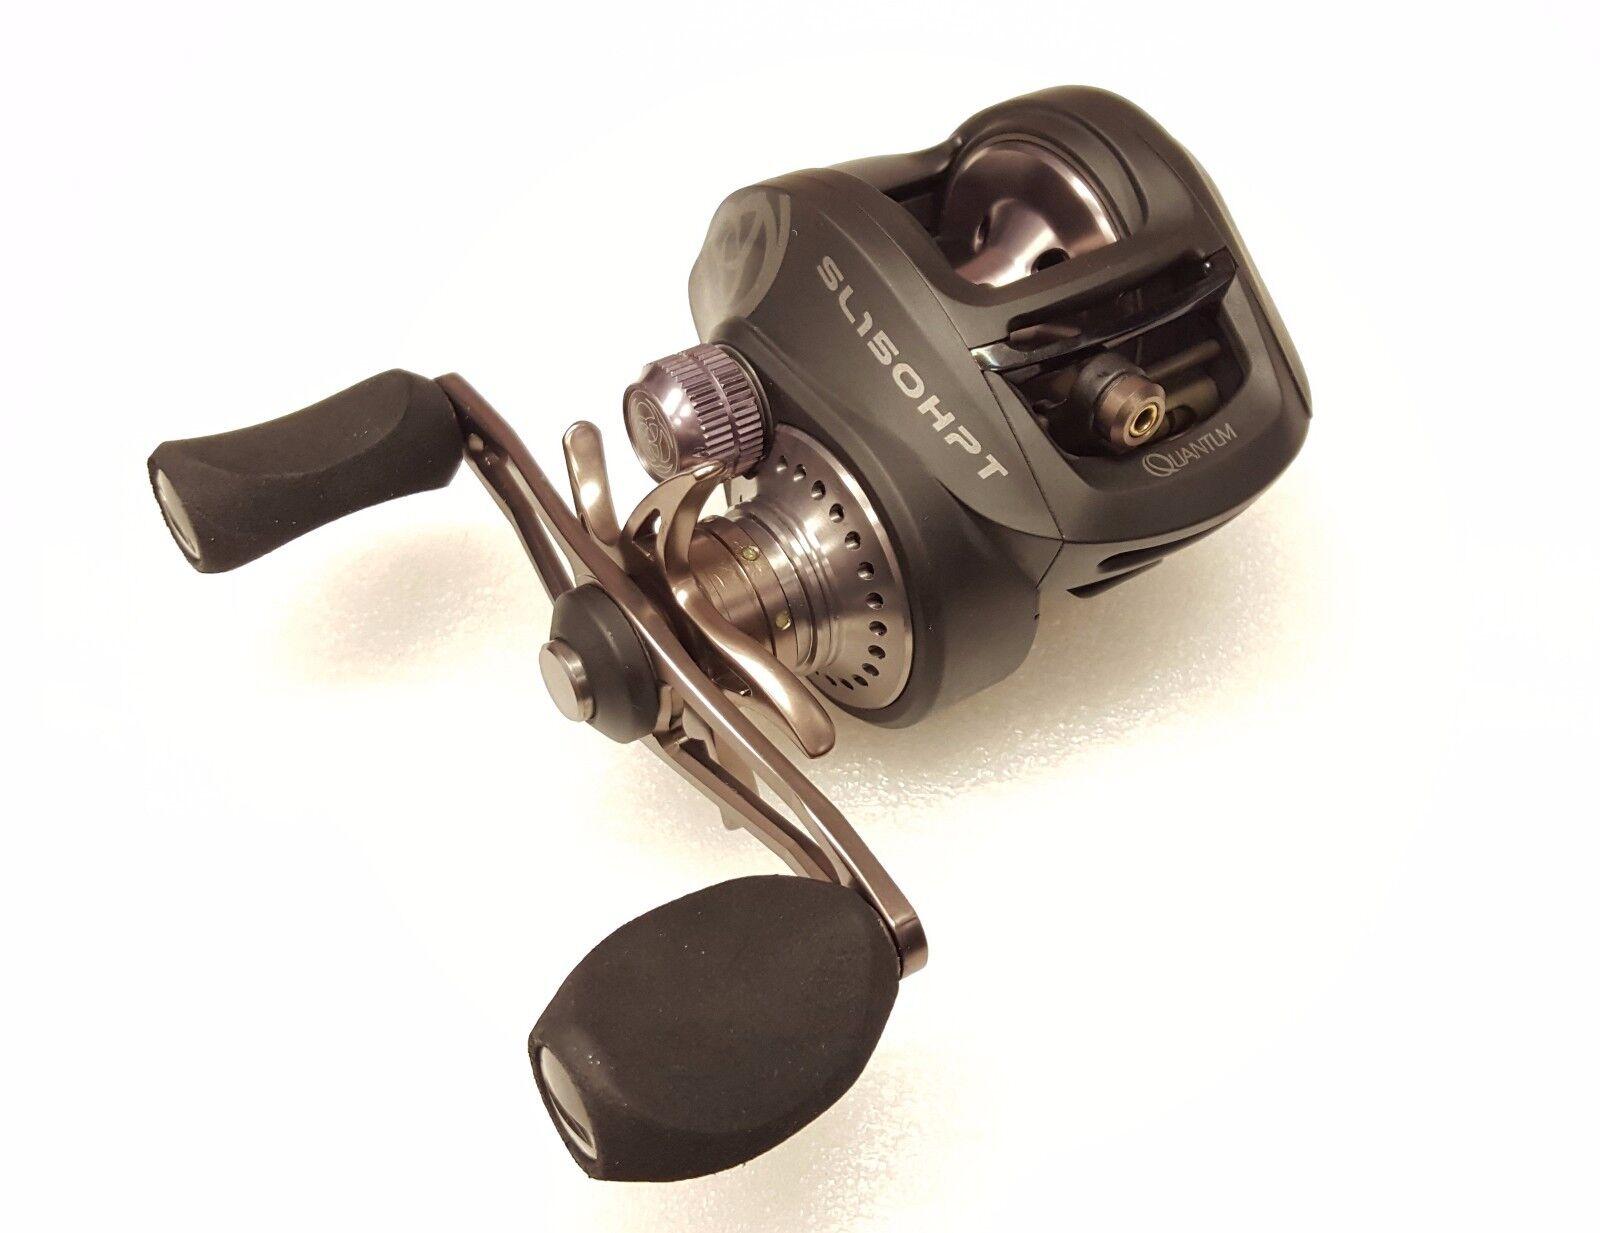 Quantum Smoke 150 HPT 7.3:1 Baitcast Right Hand Fishing Reel - SL150HPT